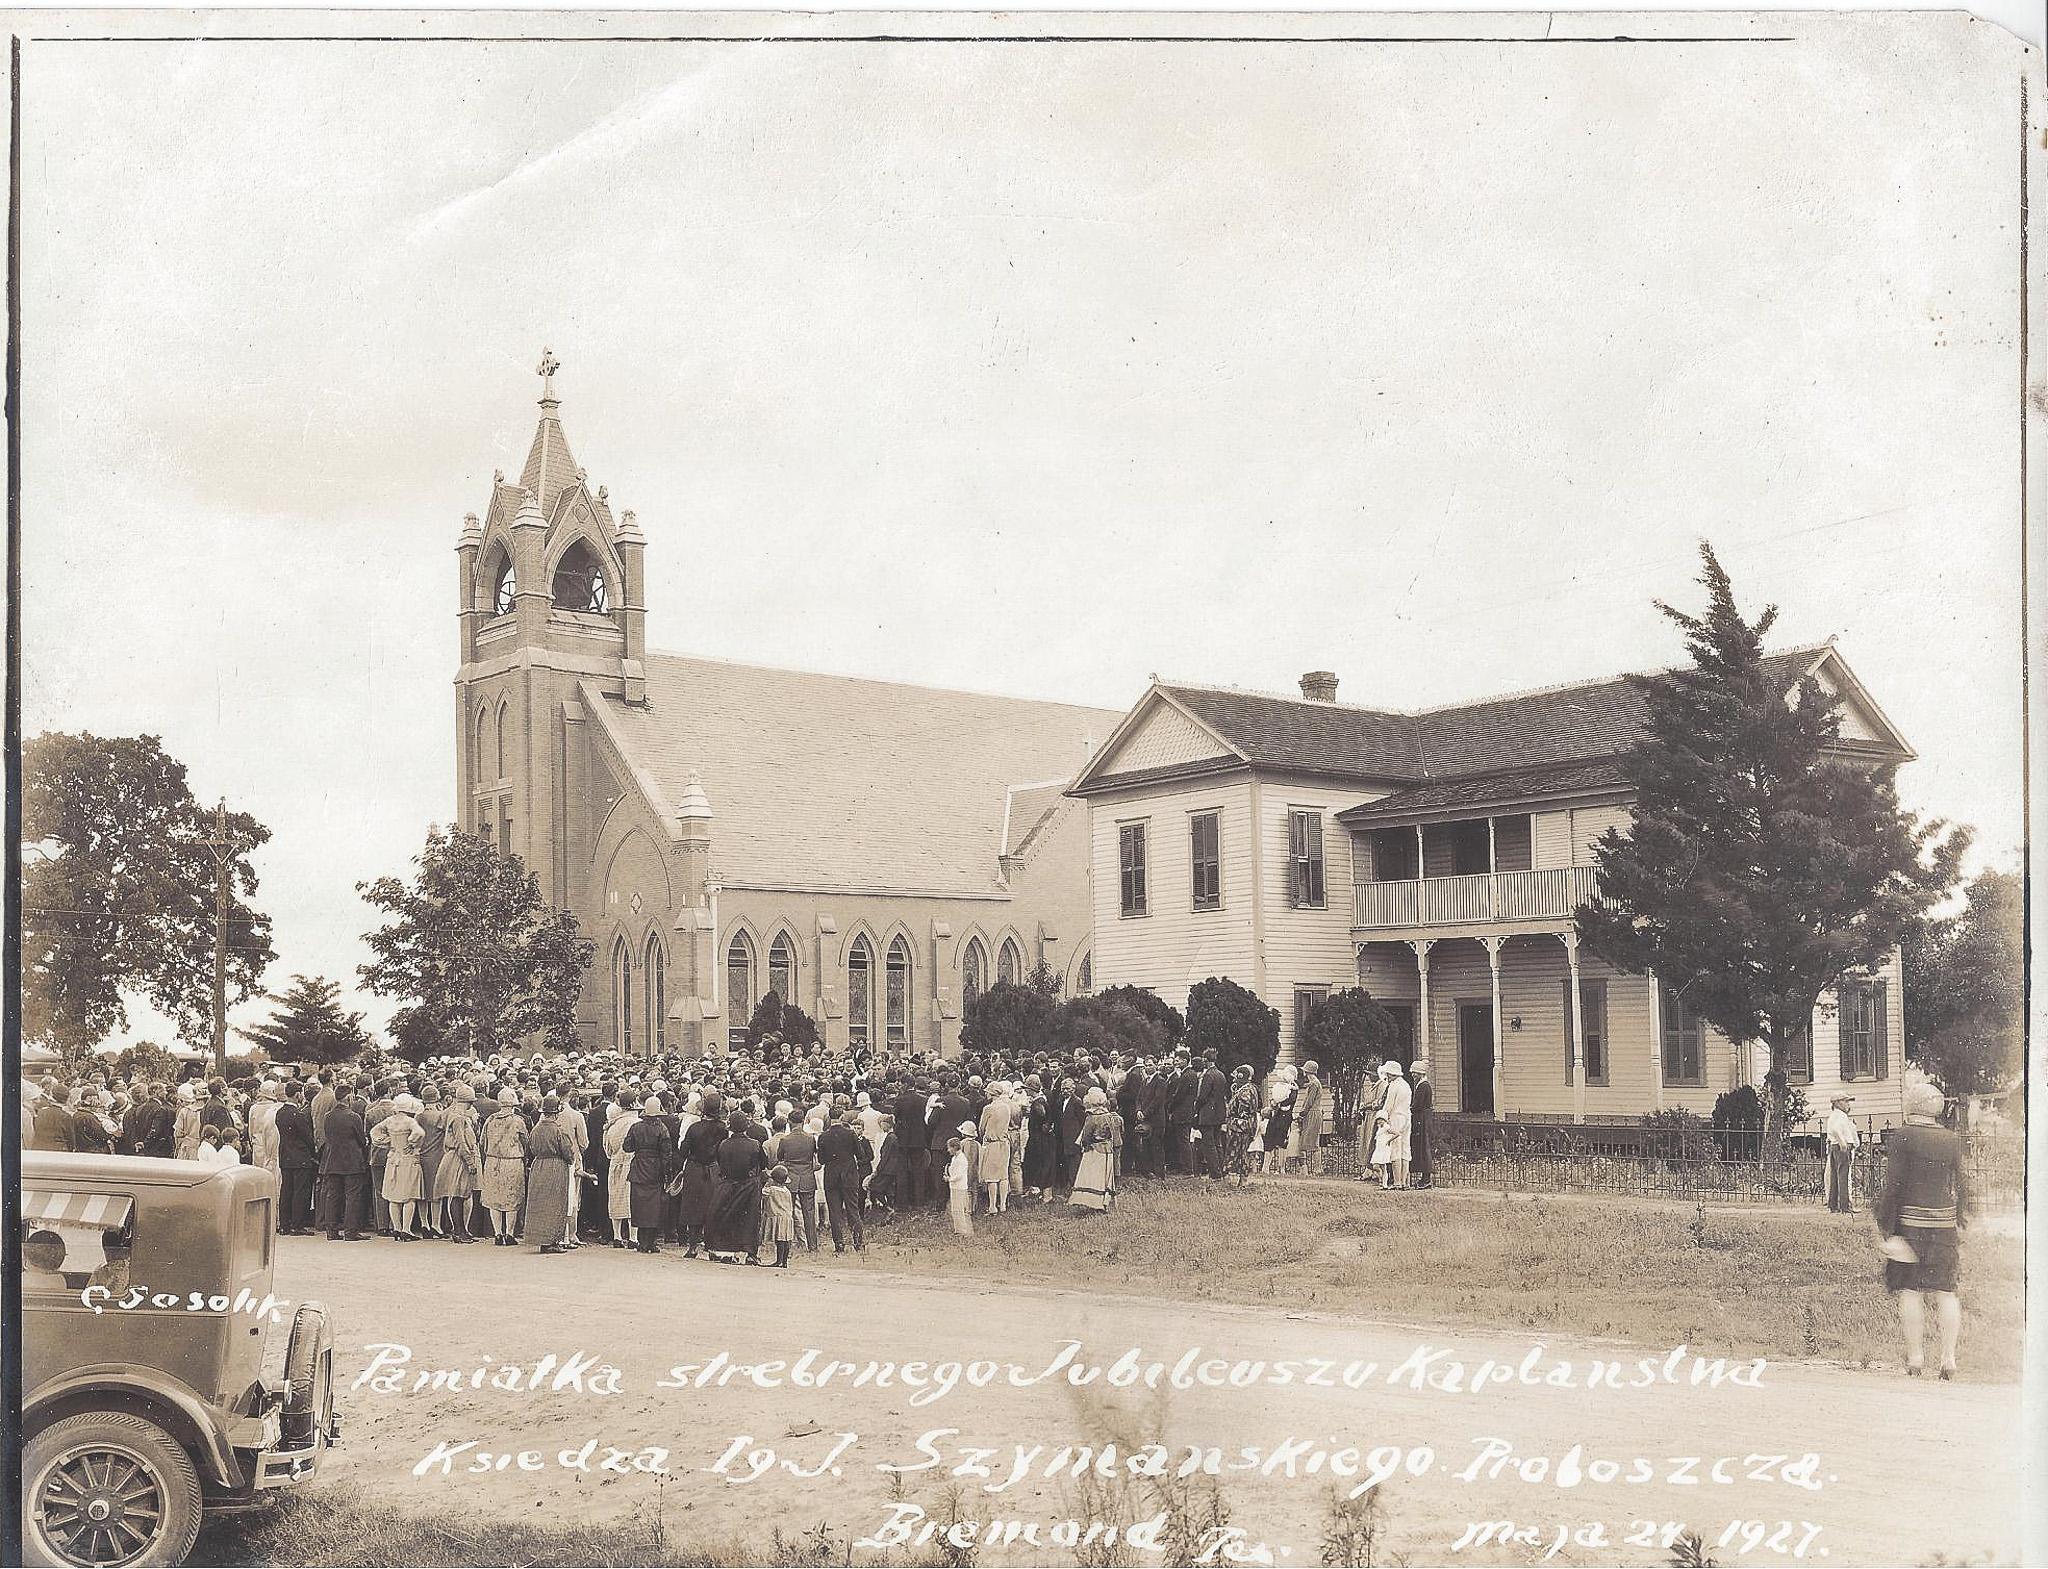 Vintage Church Photo Before Photo Restoration